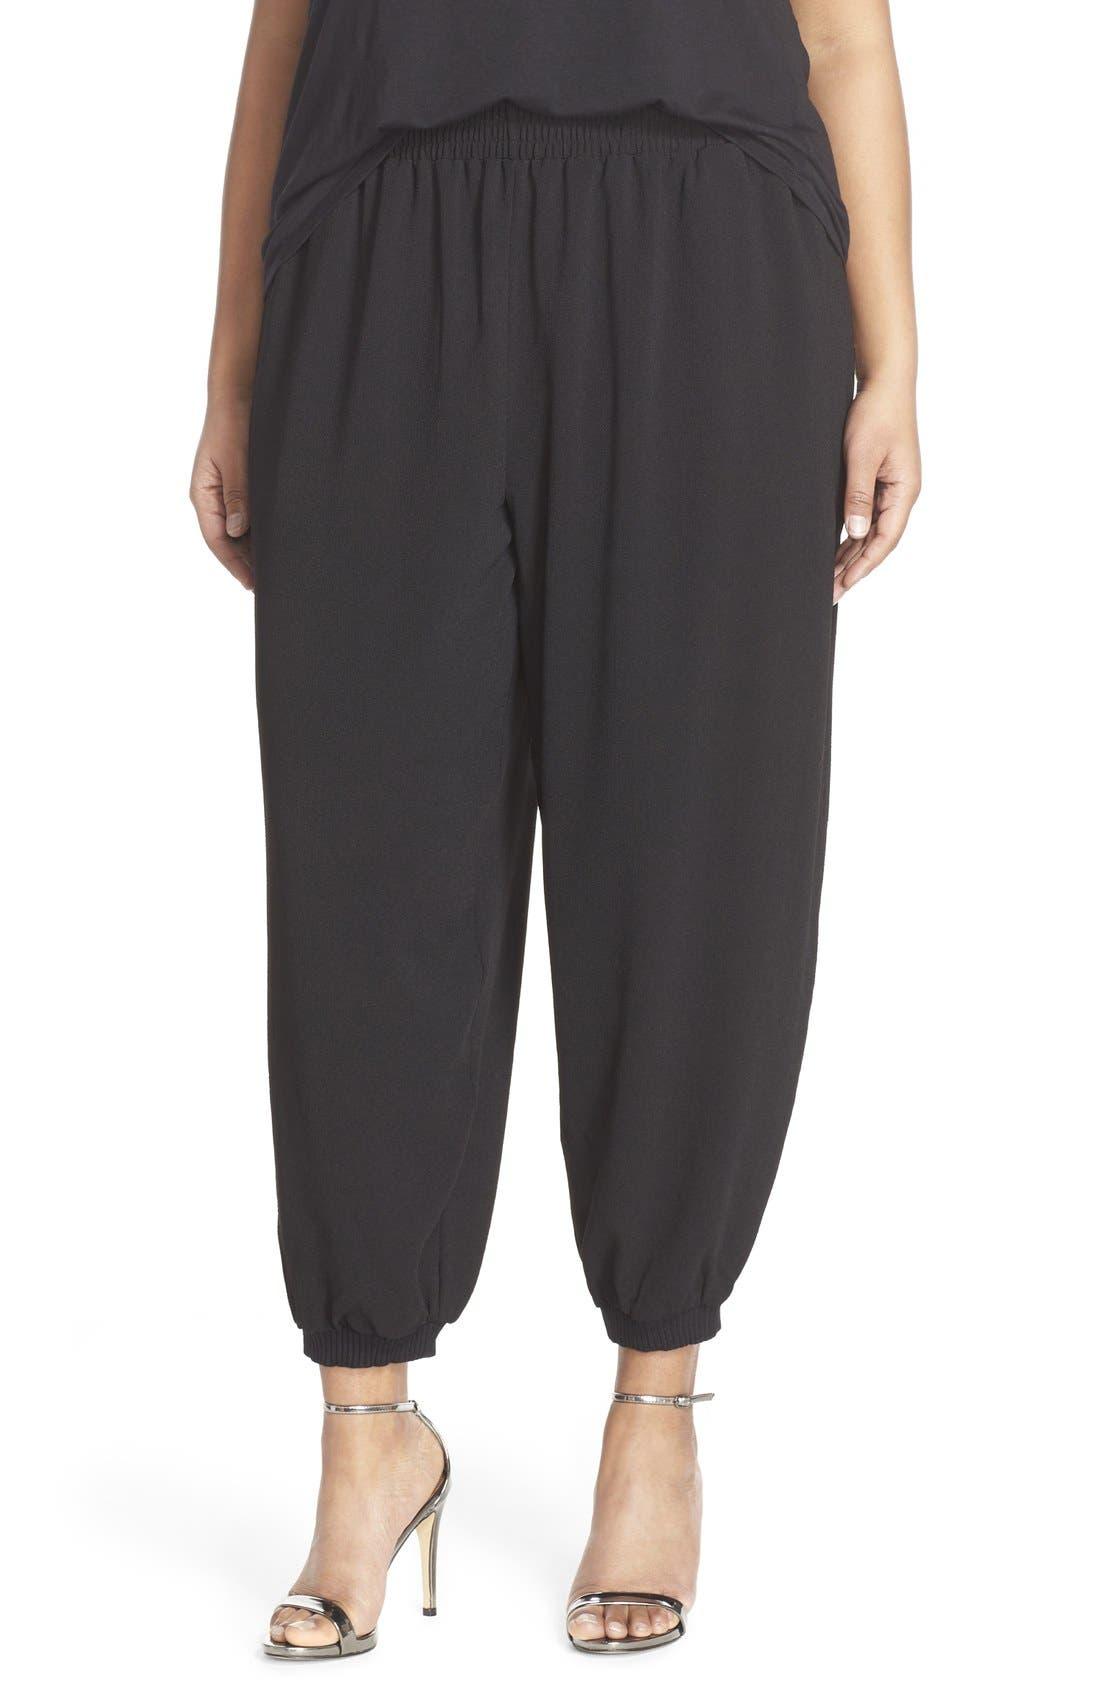 MELISSA MCCARTHY SEVEN7 Zip Pocket Harem Pants, Main, color, 001